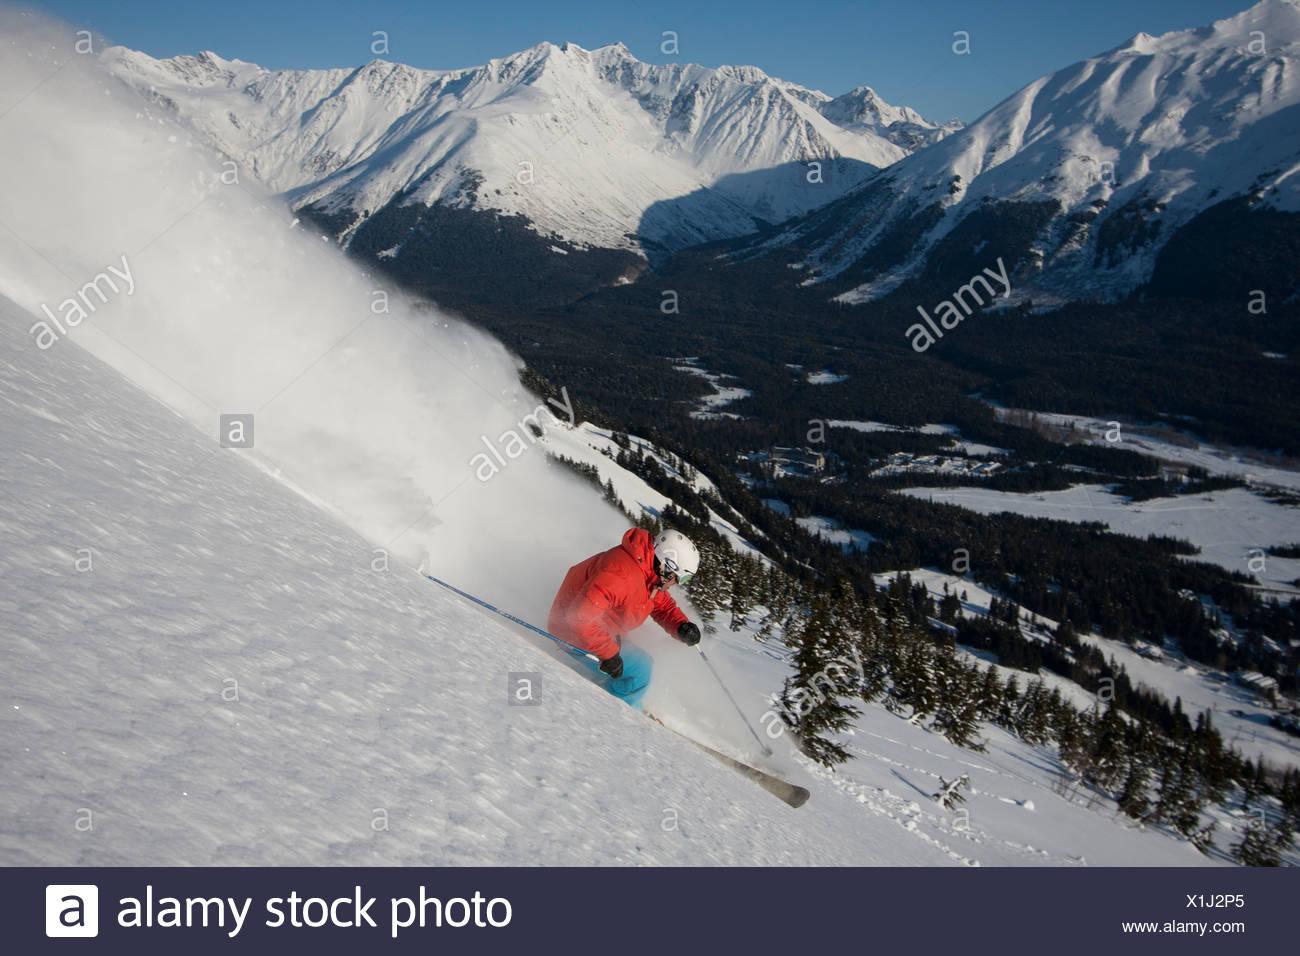 Downhill skier in the backcountry of Alyeska Resort, Southcentral Alaska, Winter - Stock Image